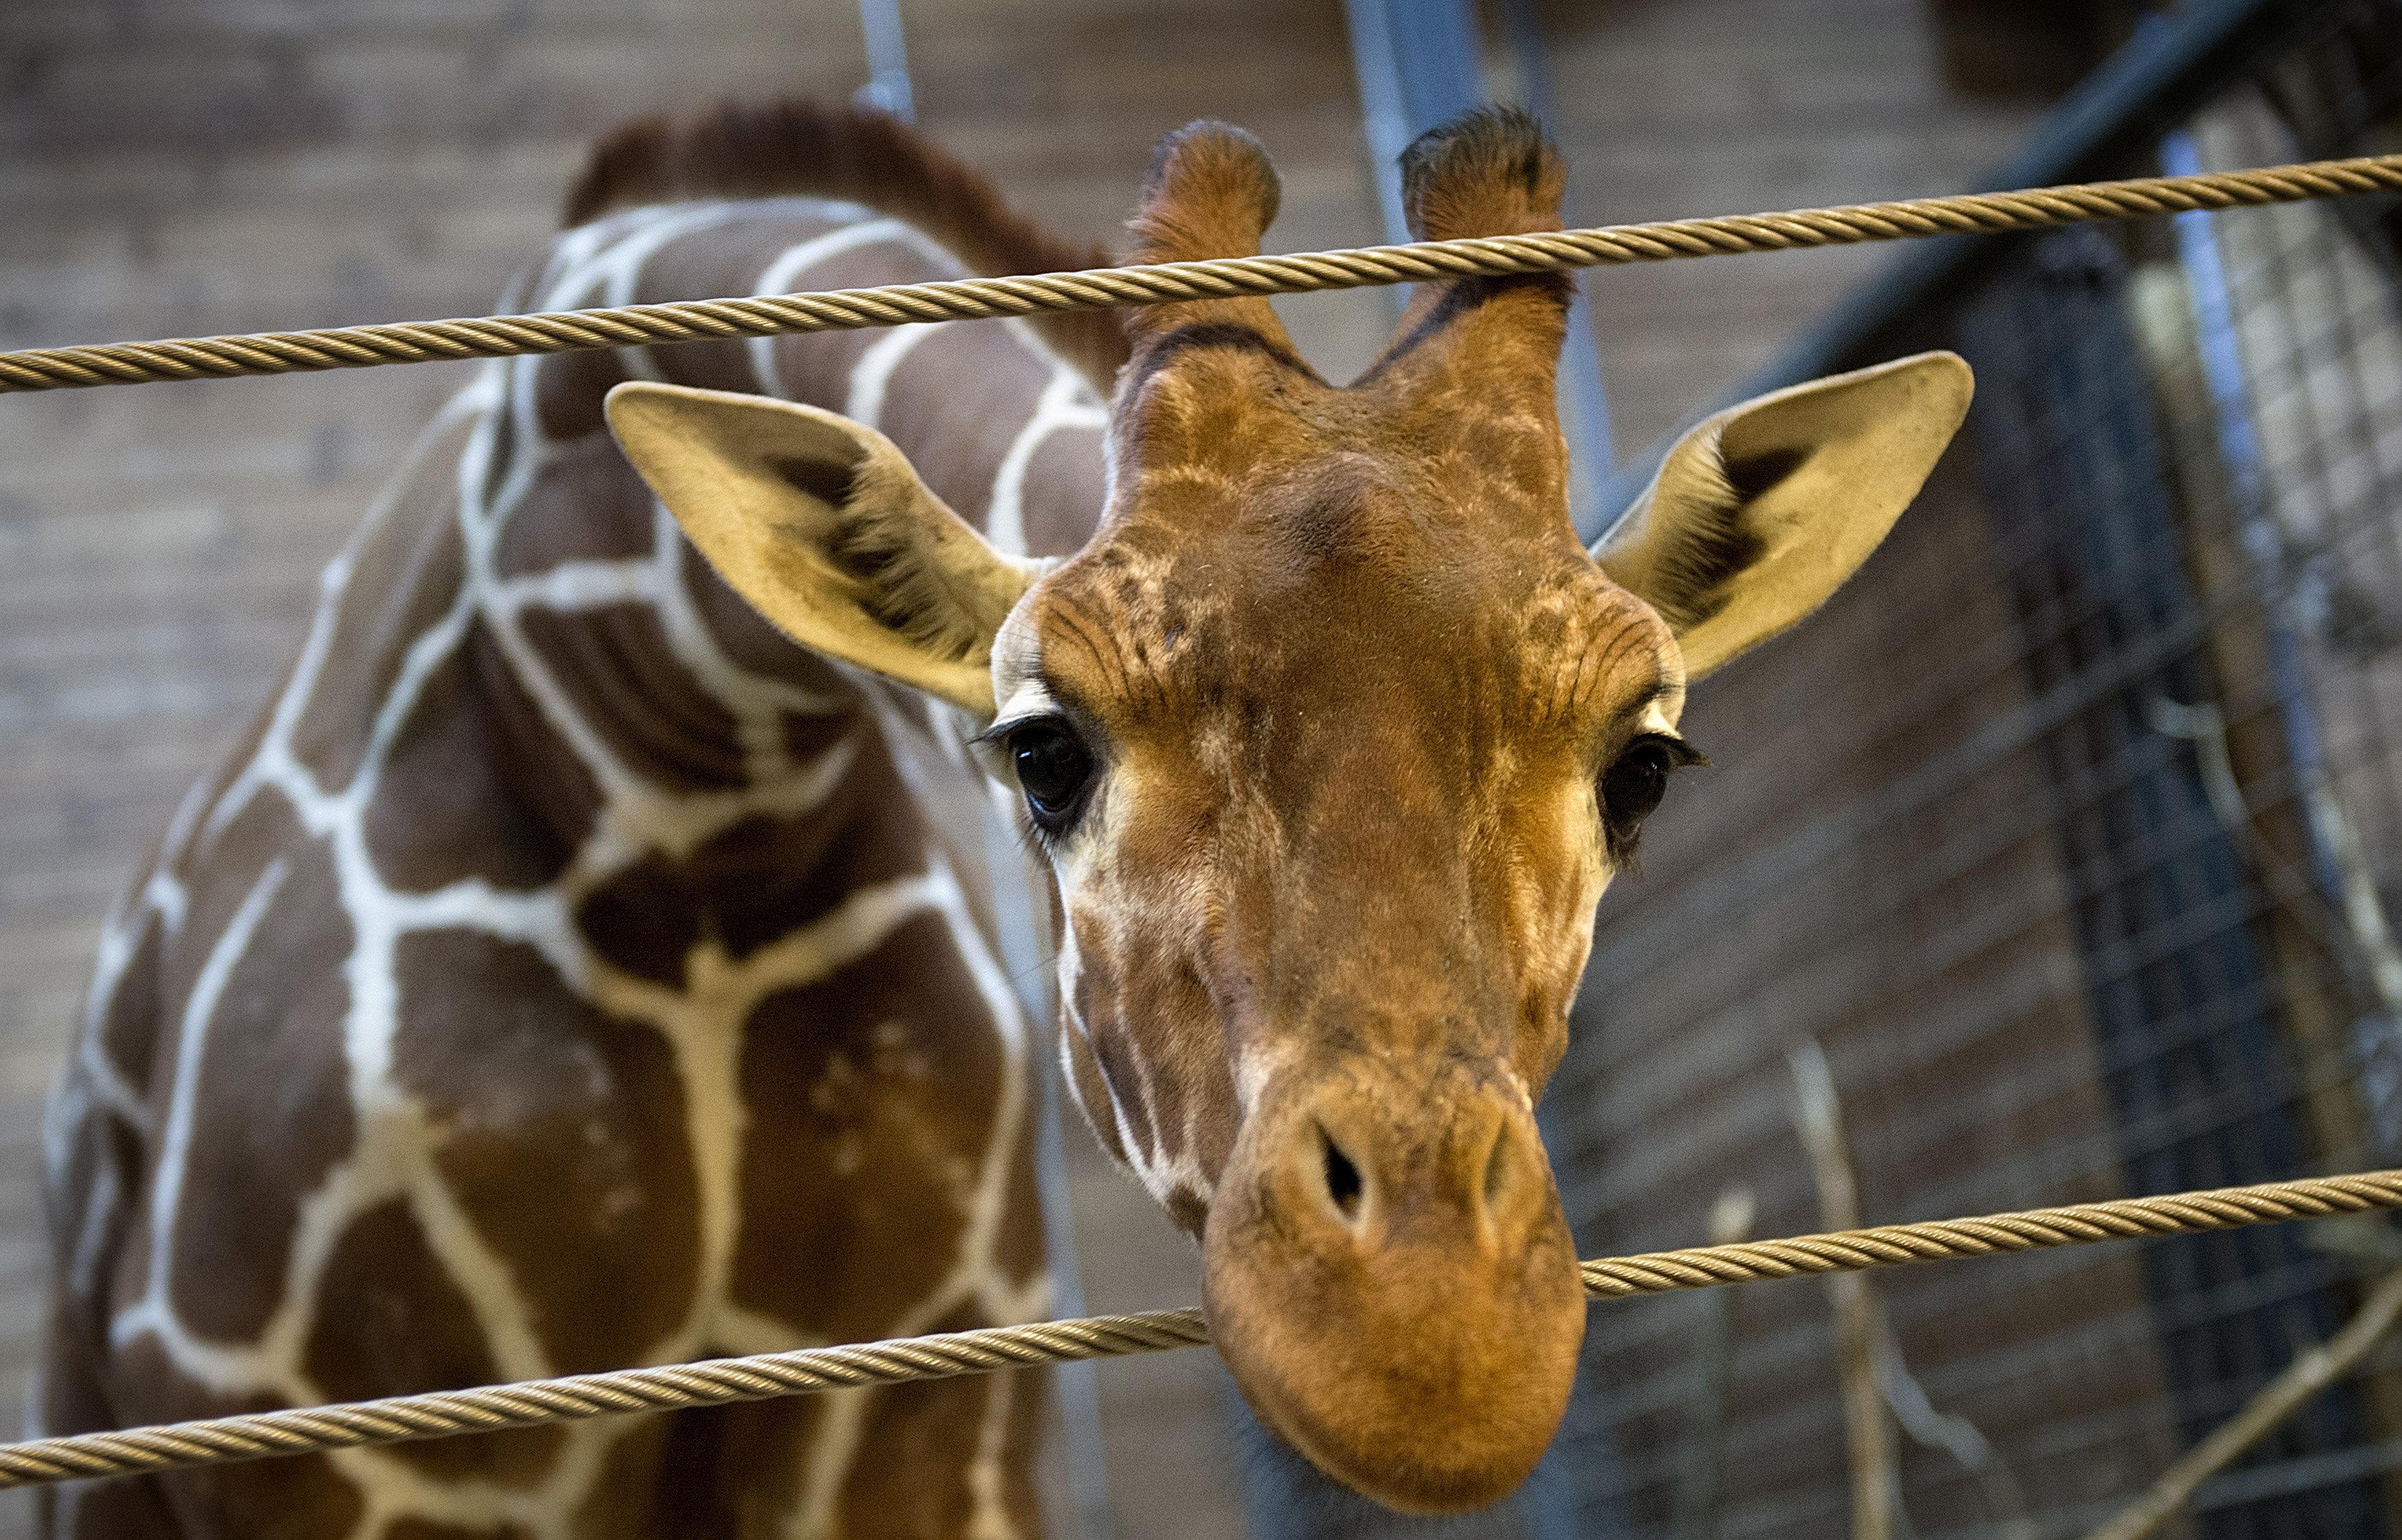 Giraffe-Killing Zoo Gets New Baby